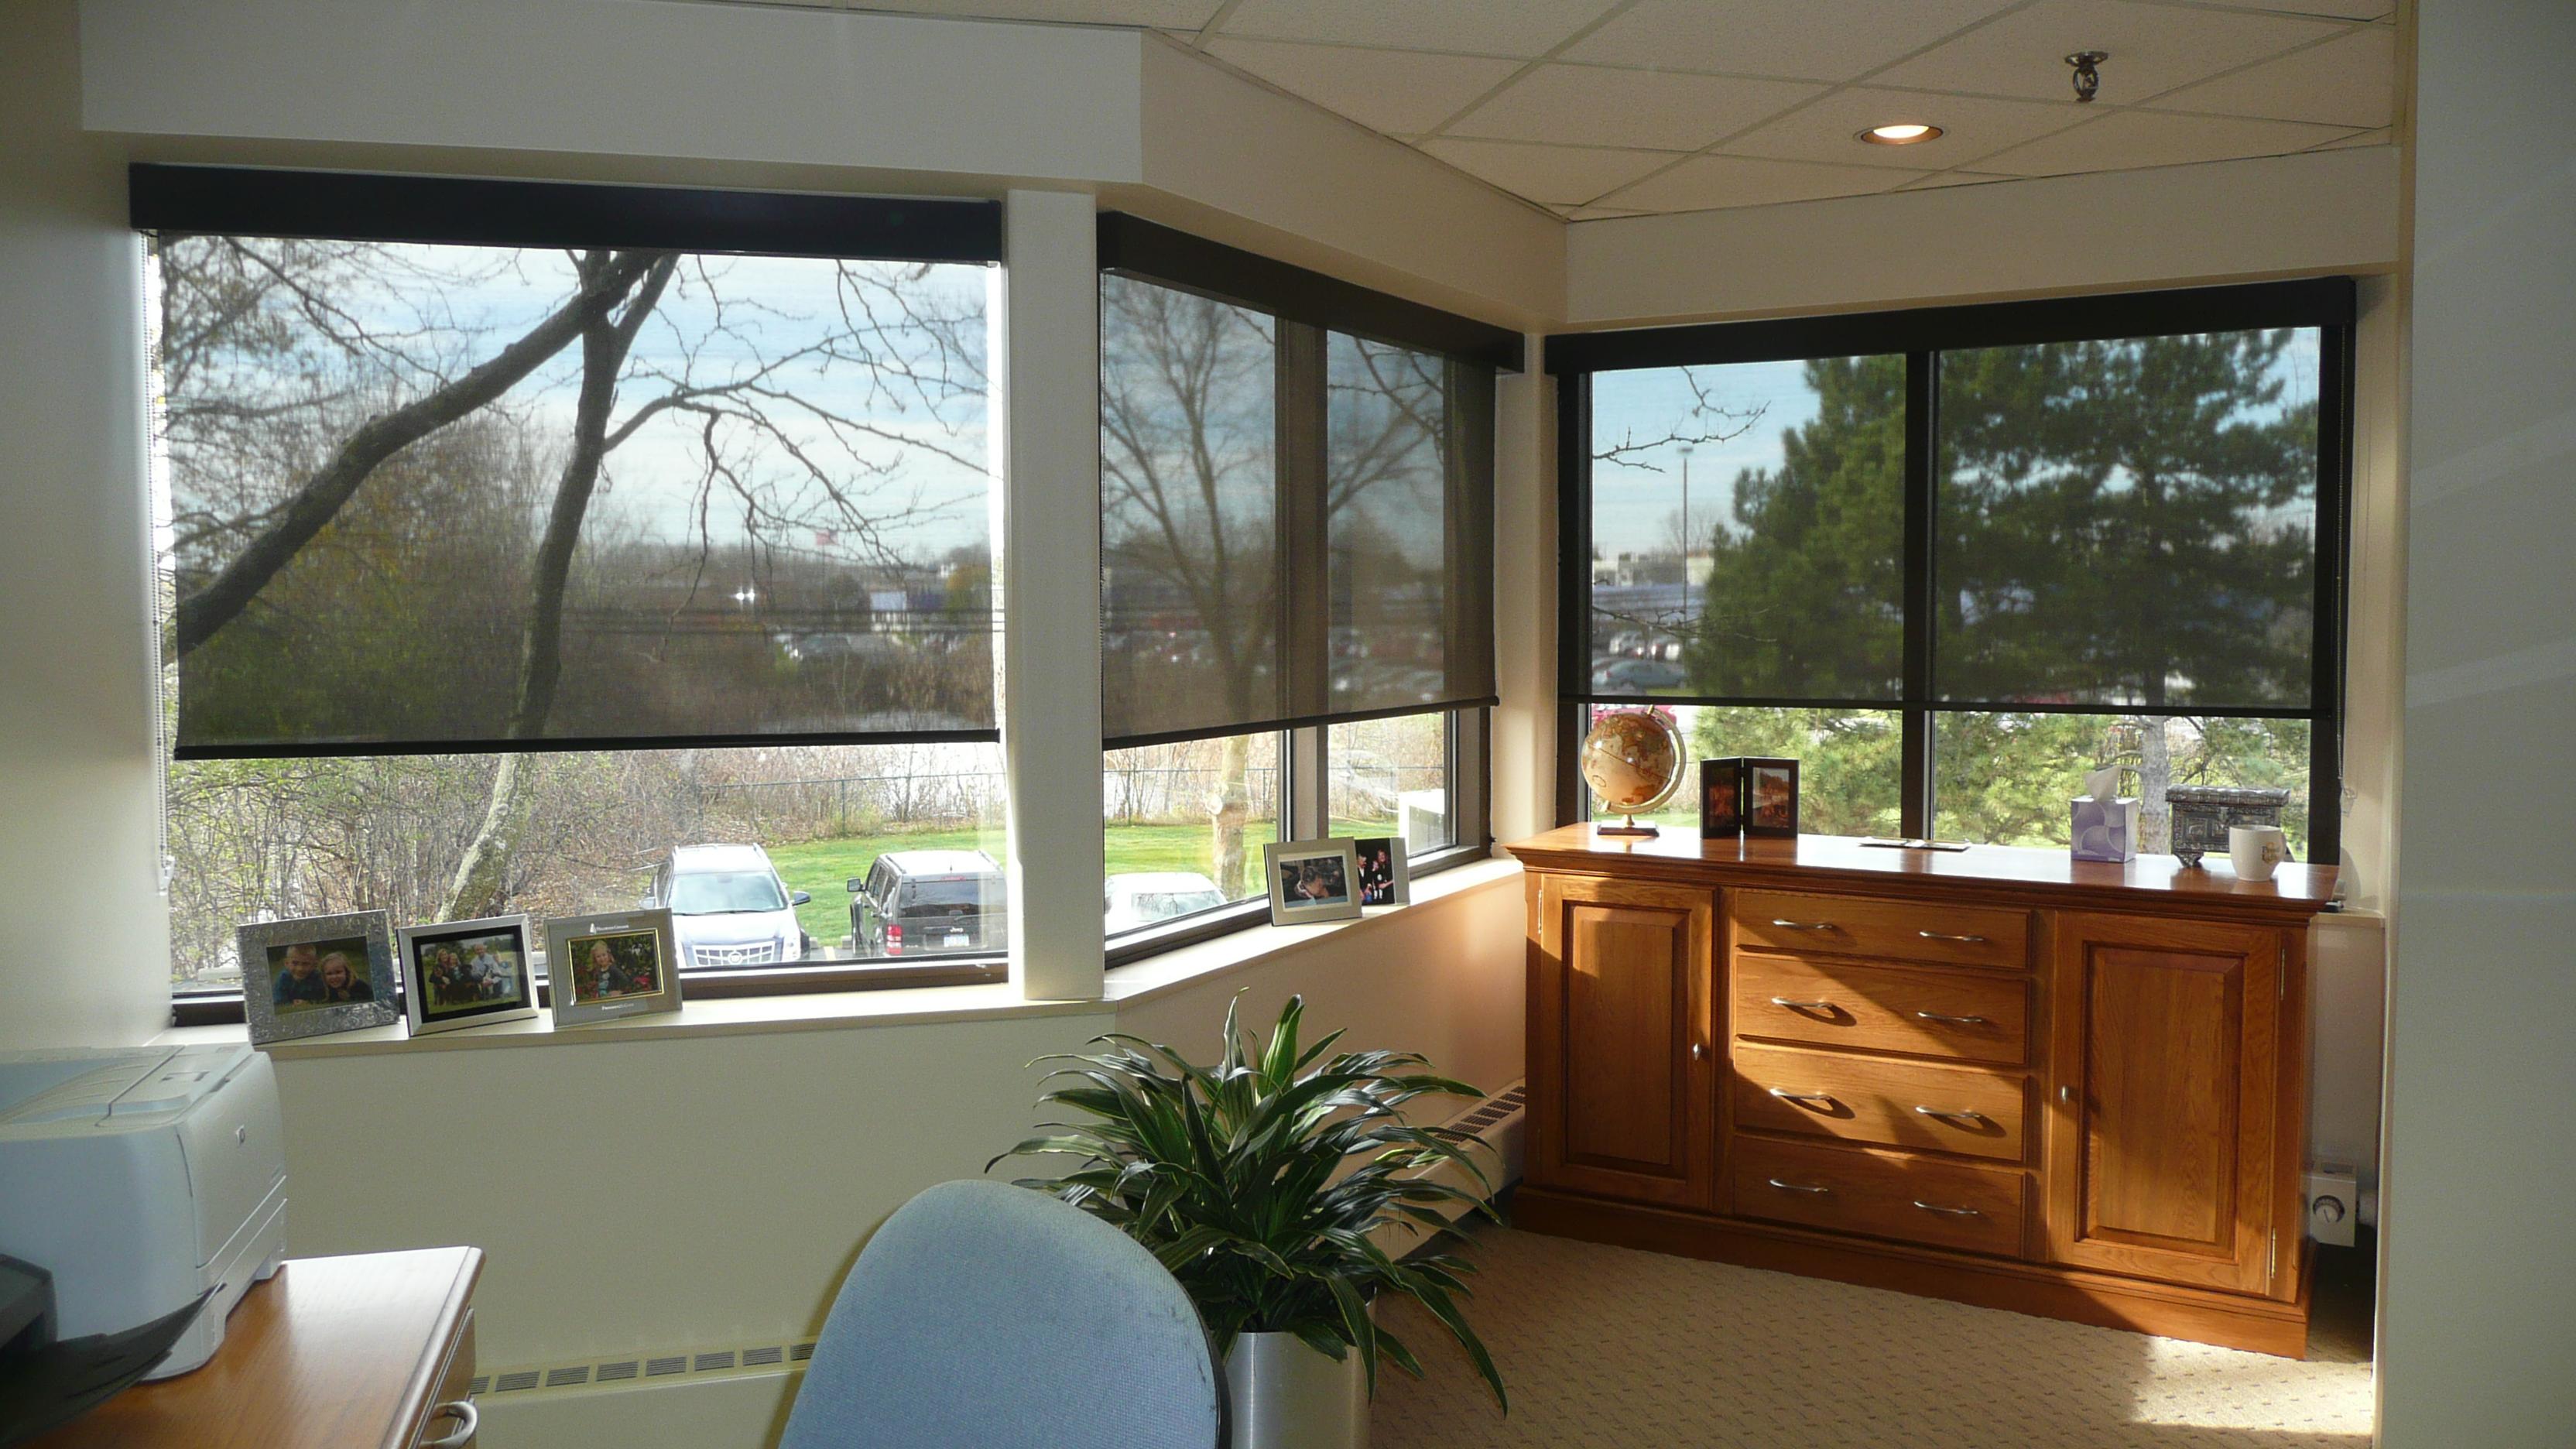 Rolling Solar Shades Window Shades Bay Screens Amp Shades